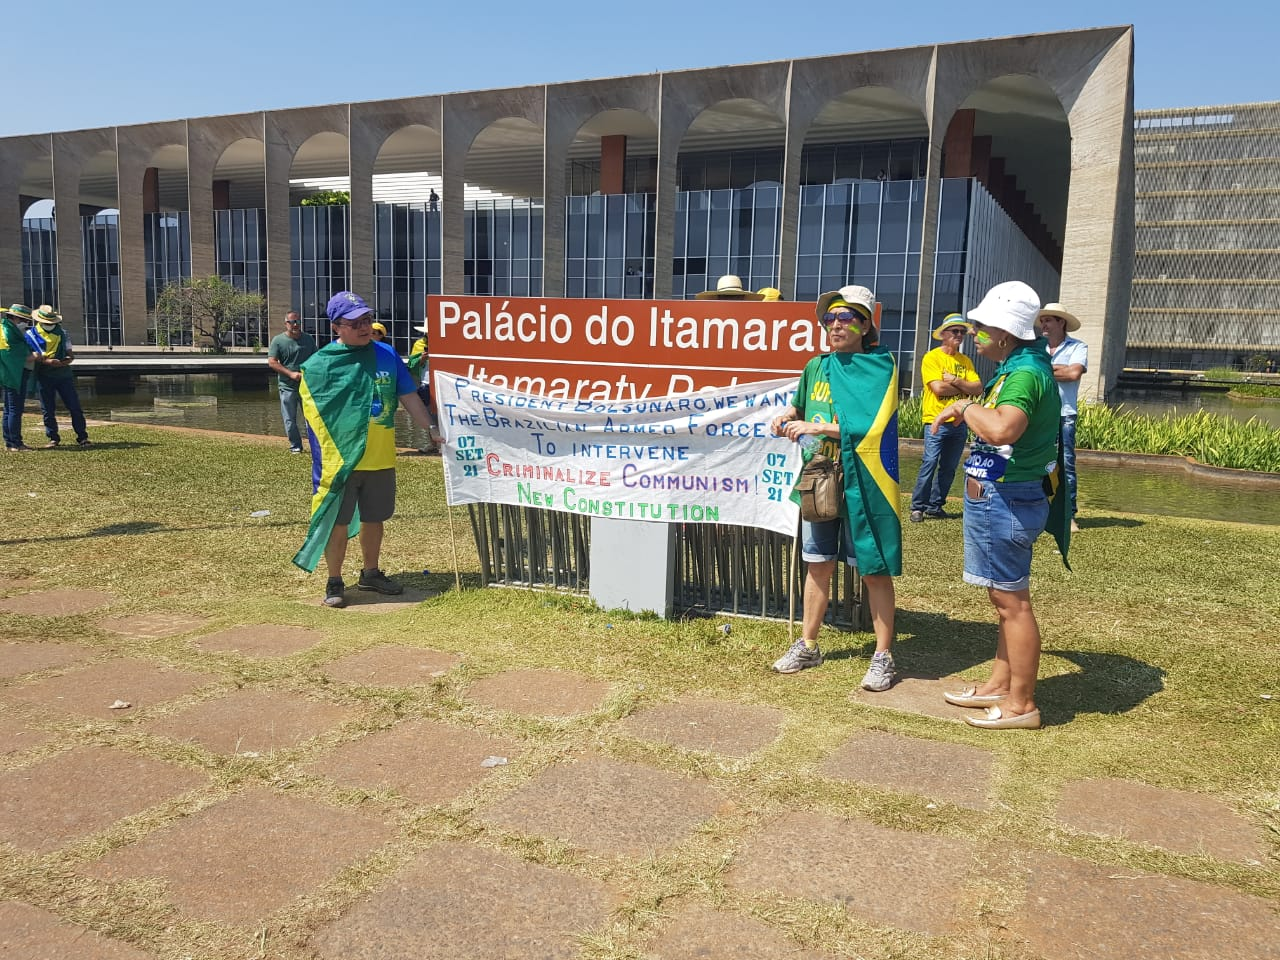 IMAGEM: Debandada de manifestantes da Esplanada cresce após carta de Bolsonaro